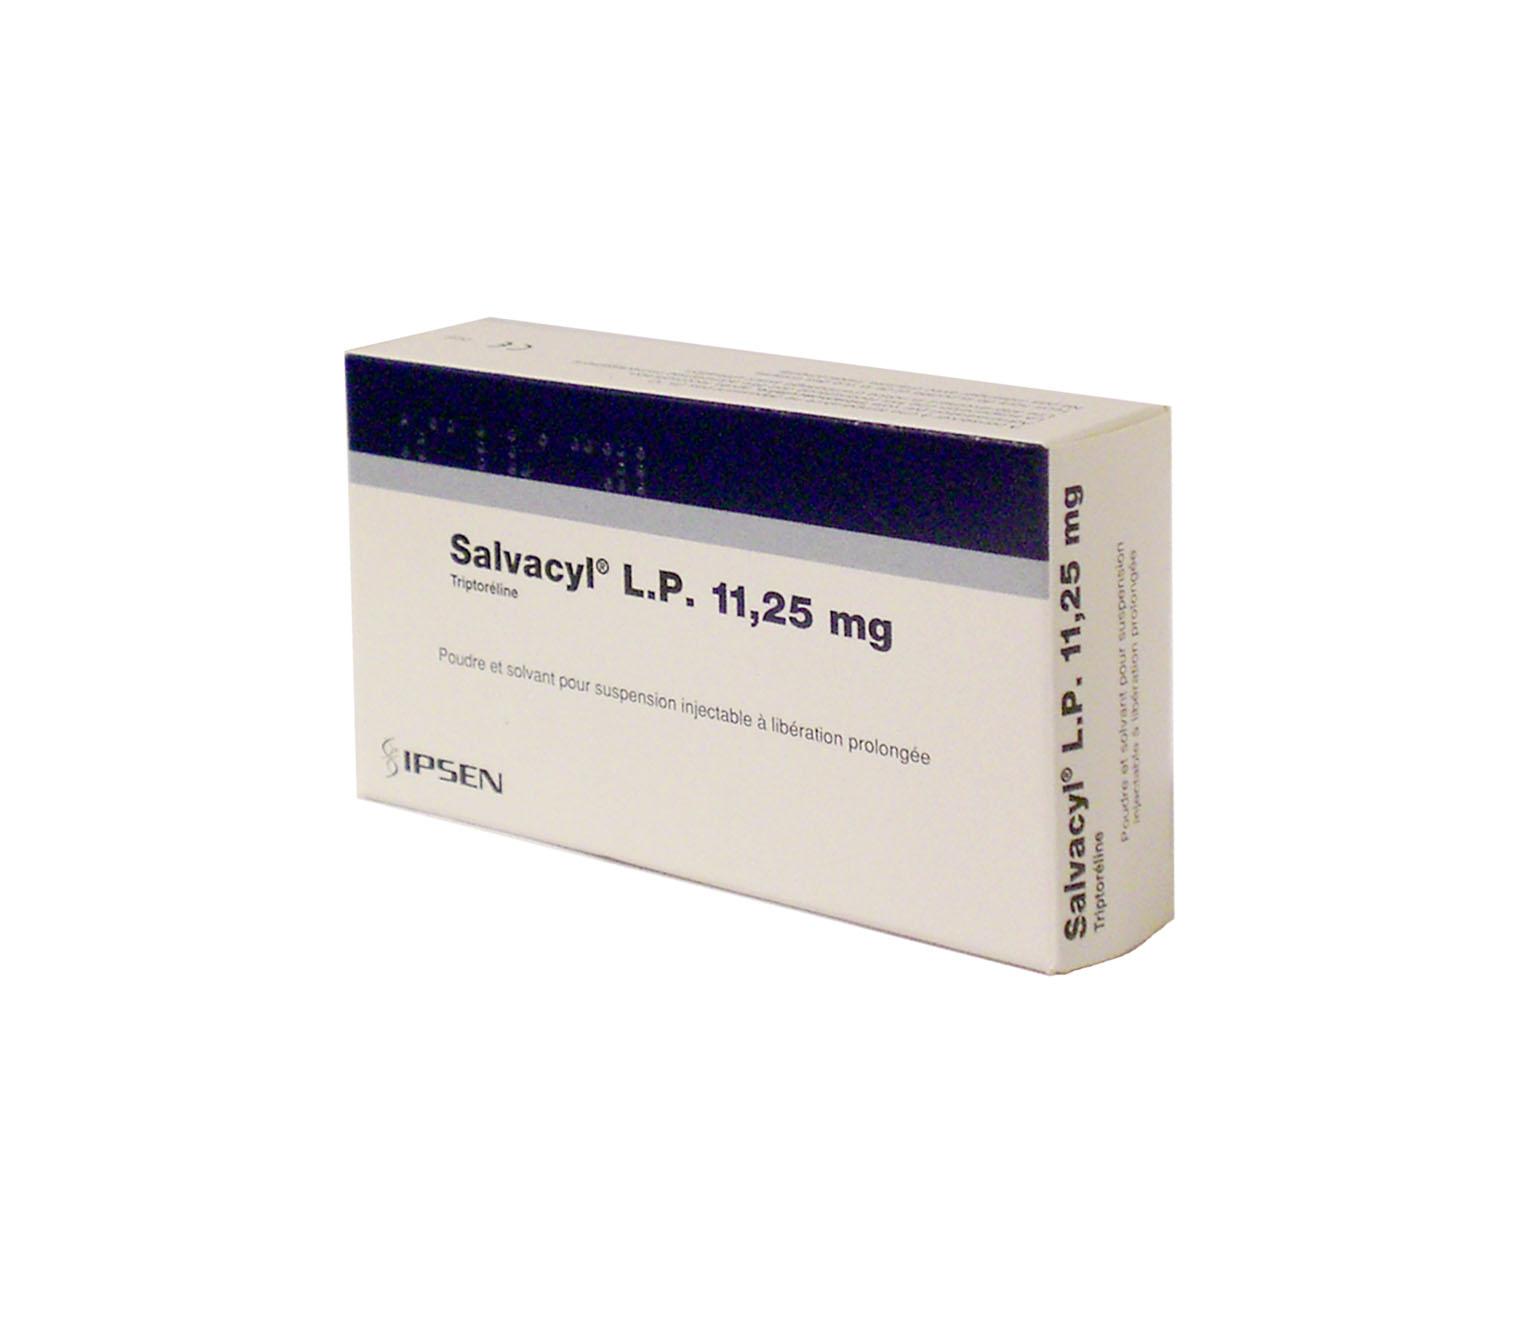 Image SALVACYL LP 11,25 mg Pdr & solv susp inj LP 1Fl+1Amp/2ml+Ser+Aig